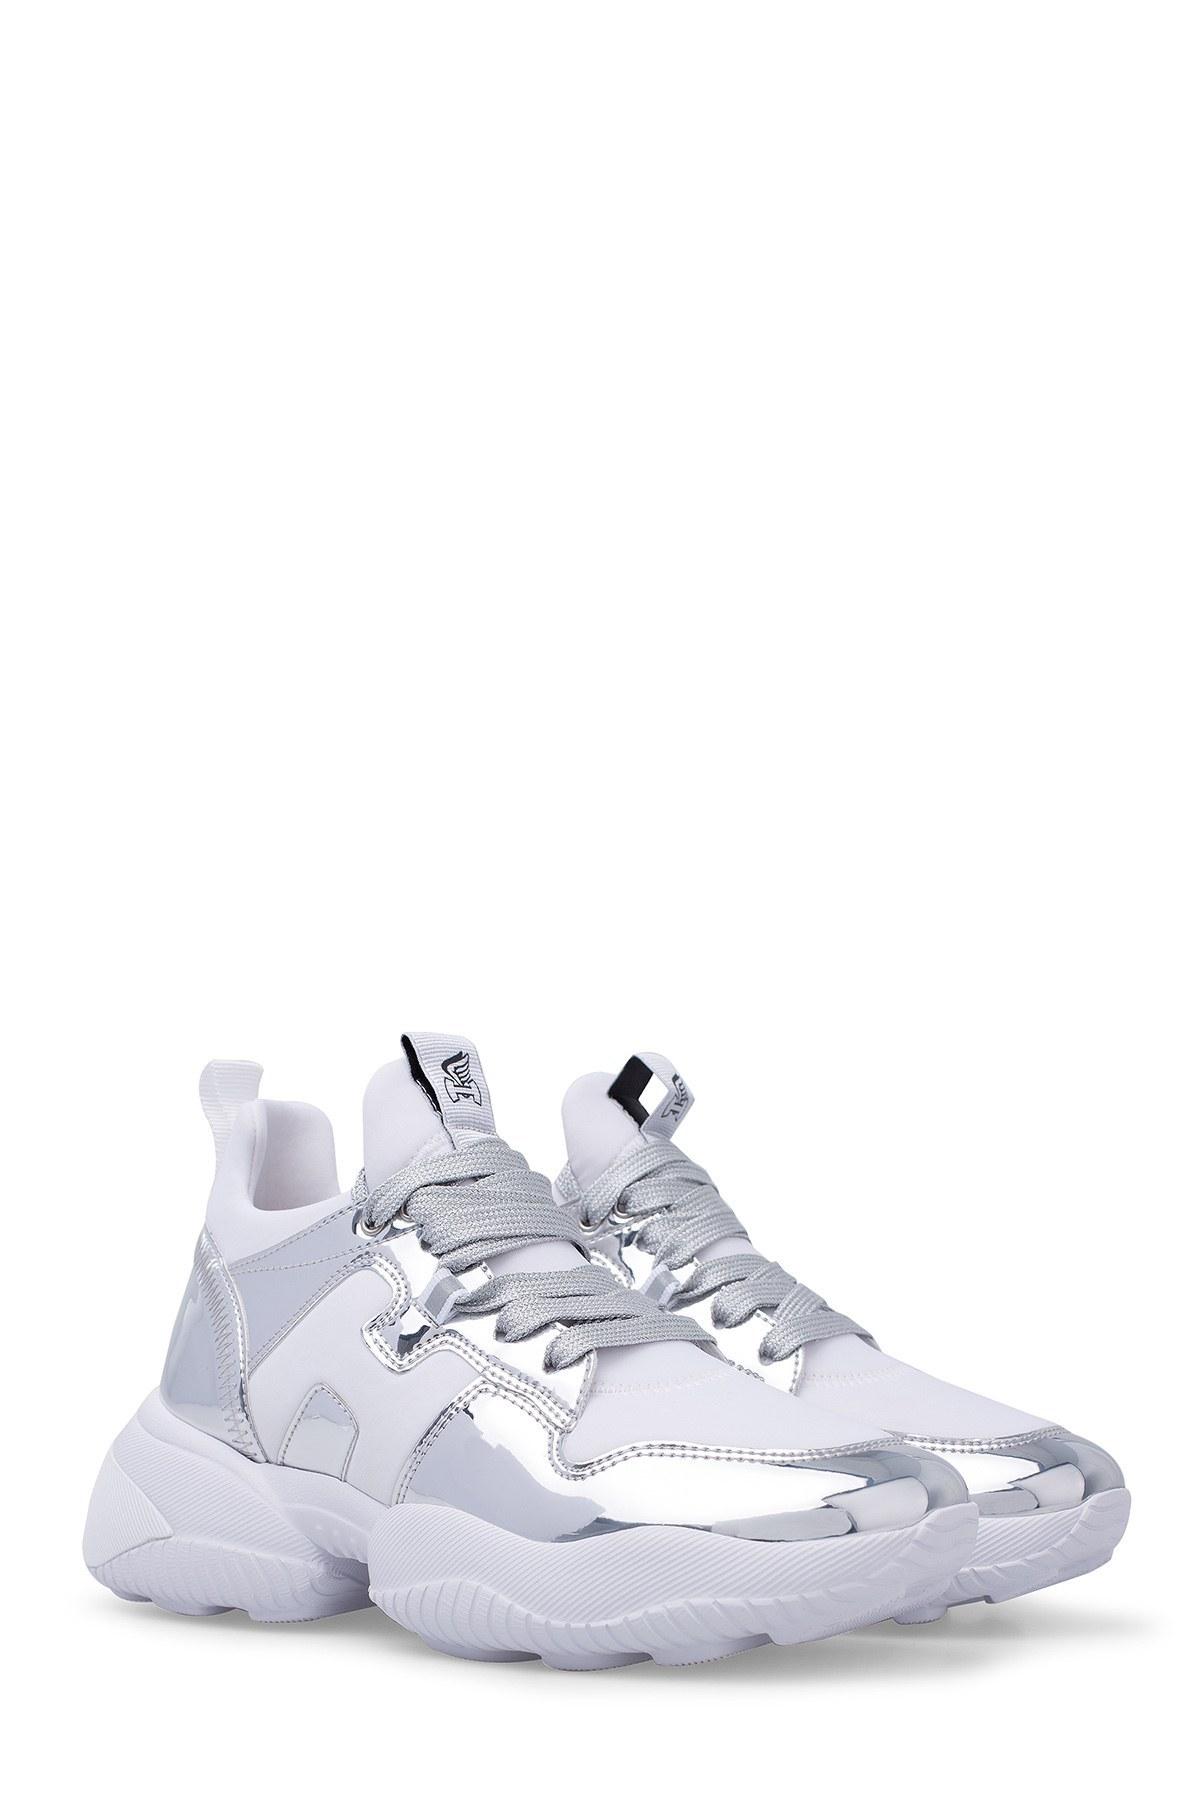 Hogan Bayan Ayakkabı HXW5250CH20MSX0351 BEYAZ